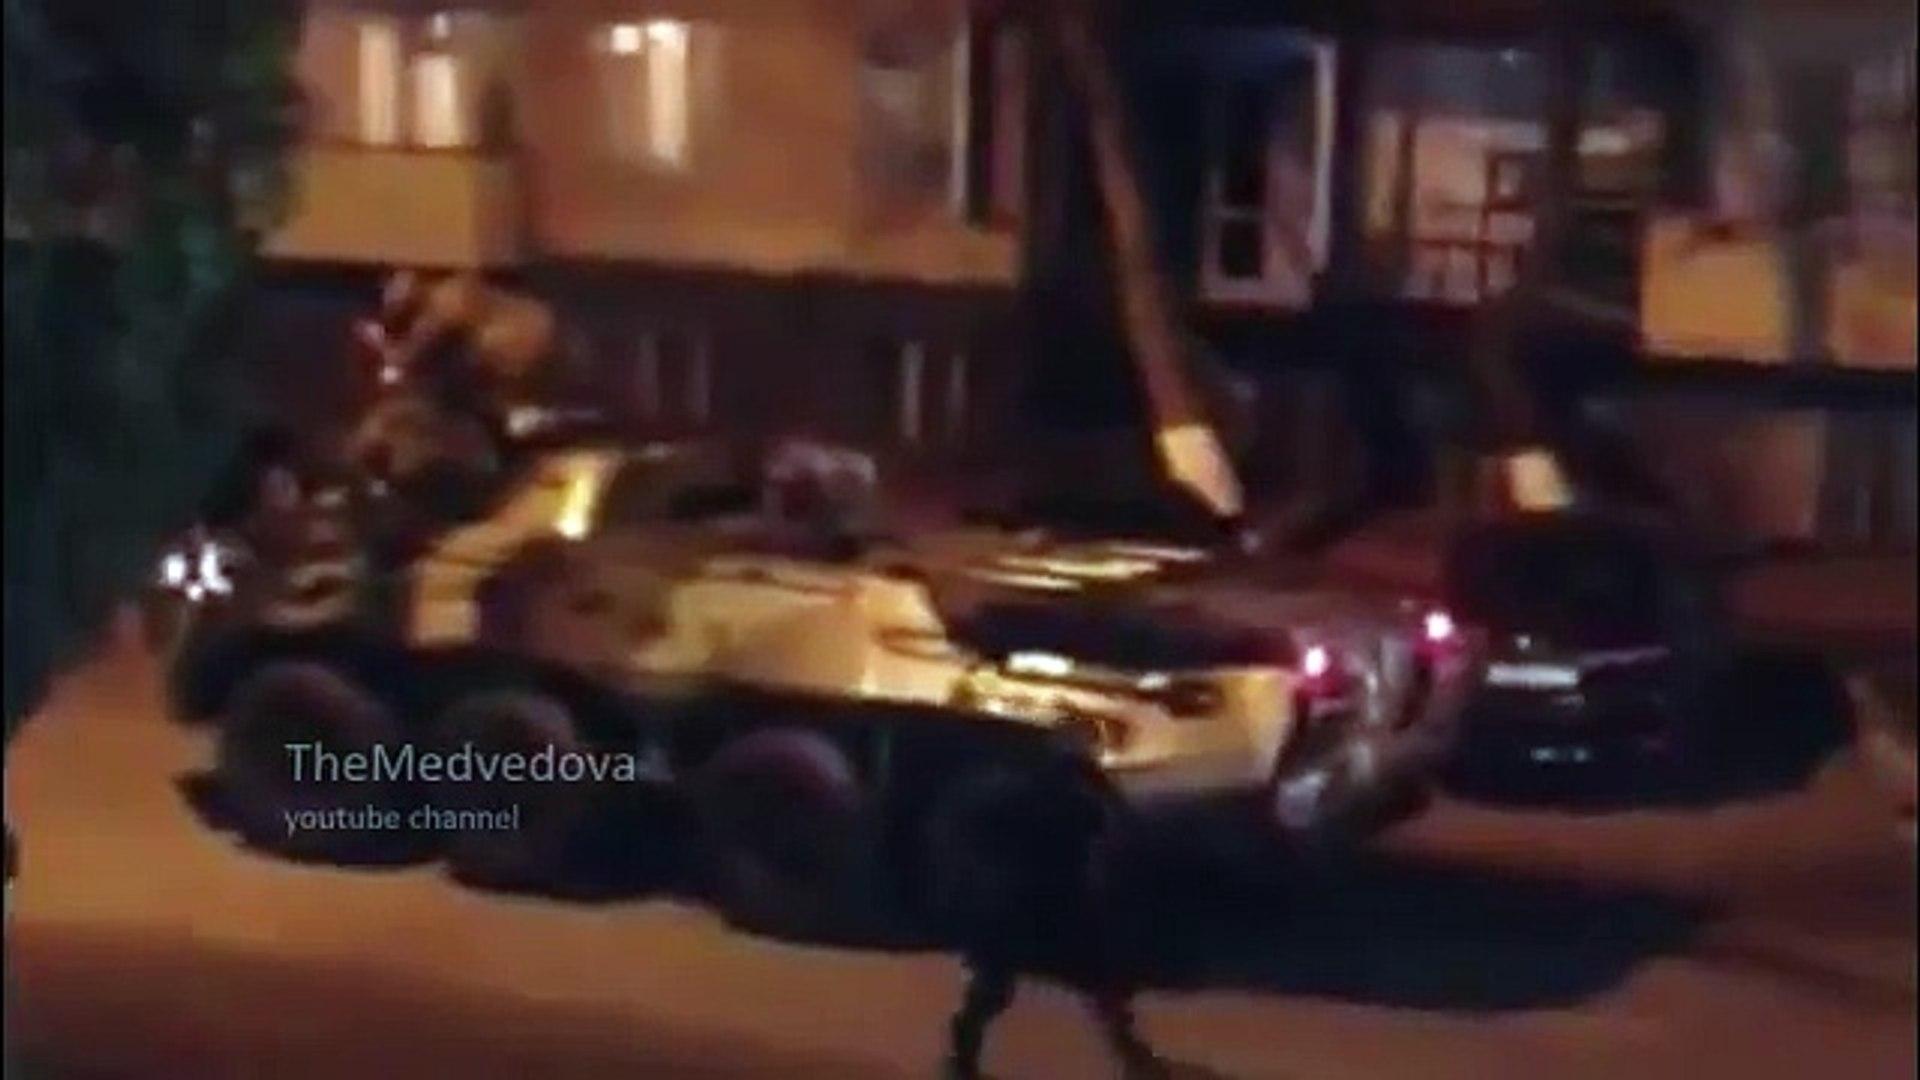 Грозный стрельба в центре / Grozny fight in the center